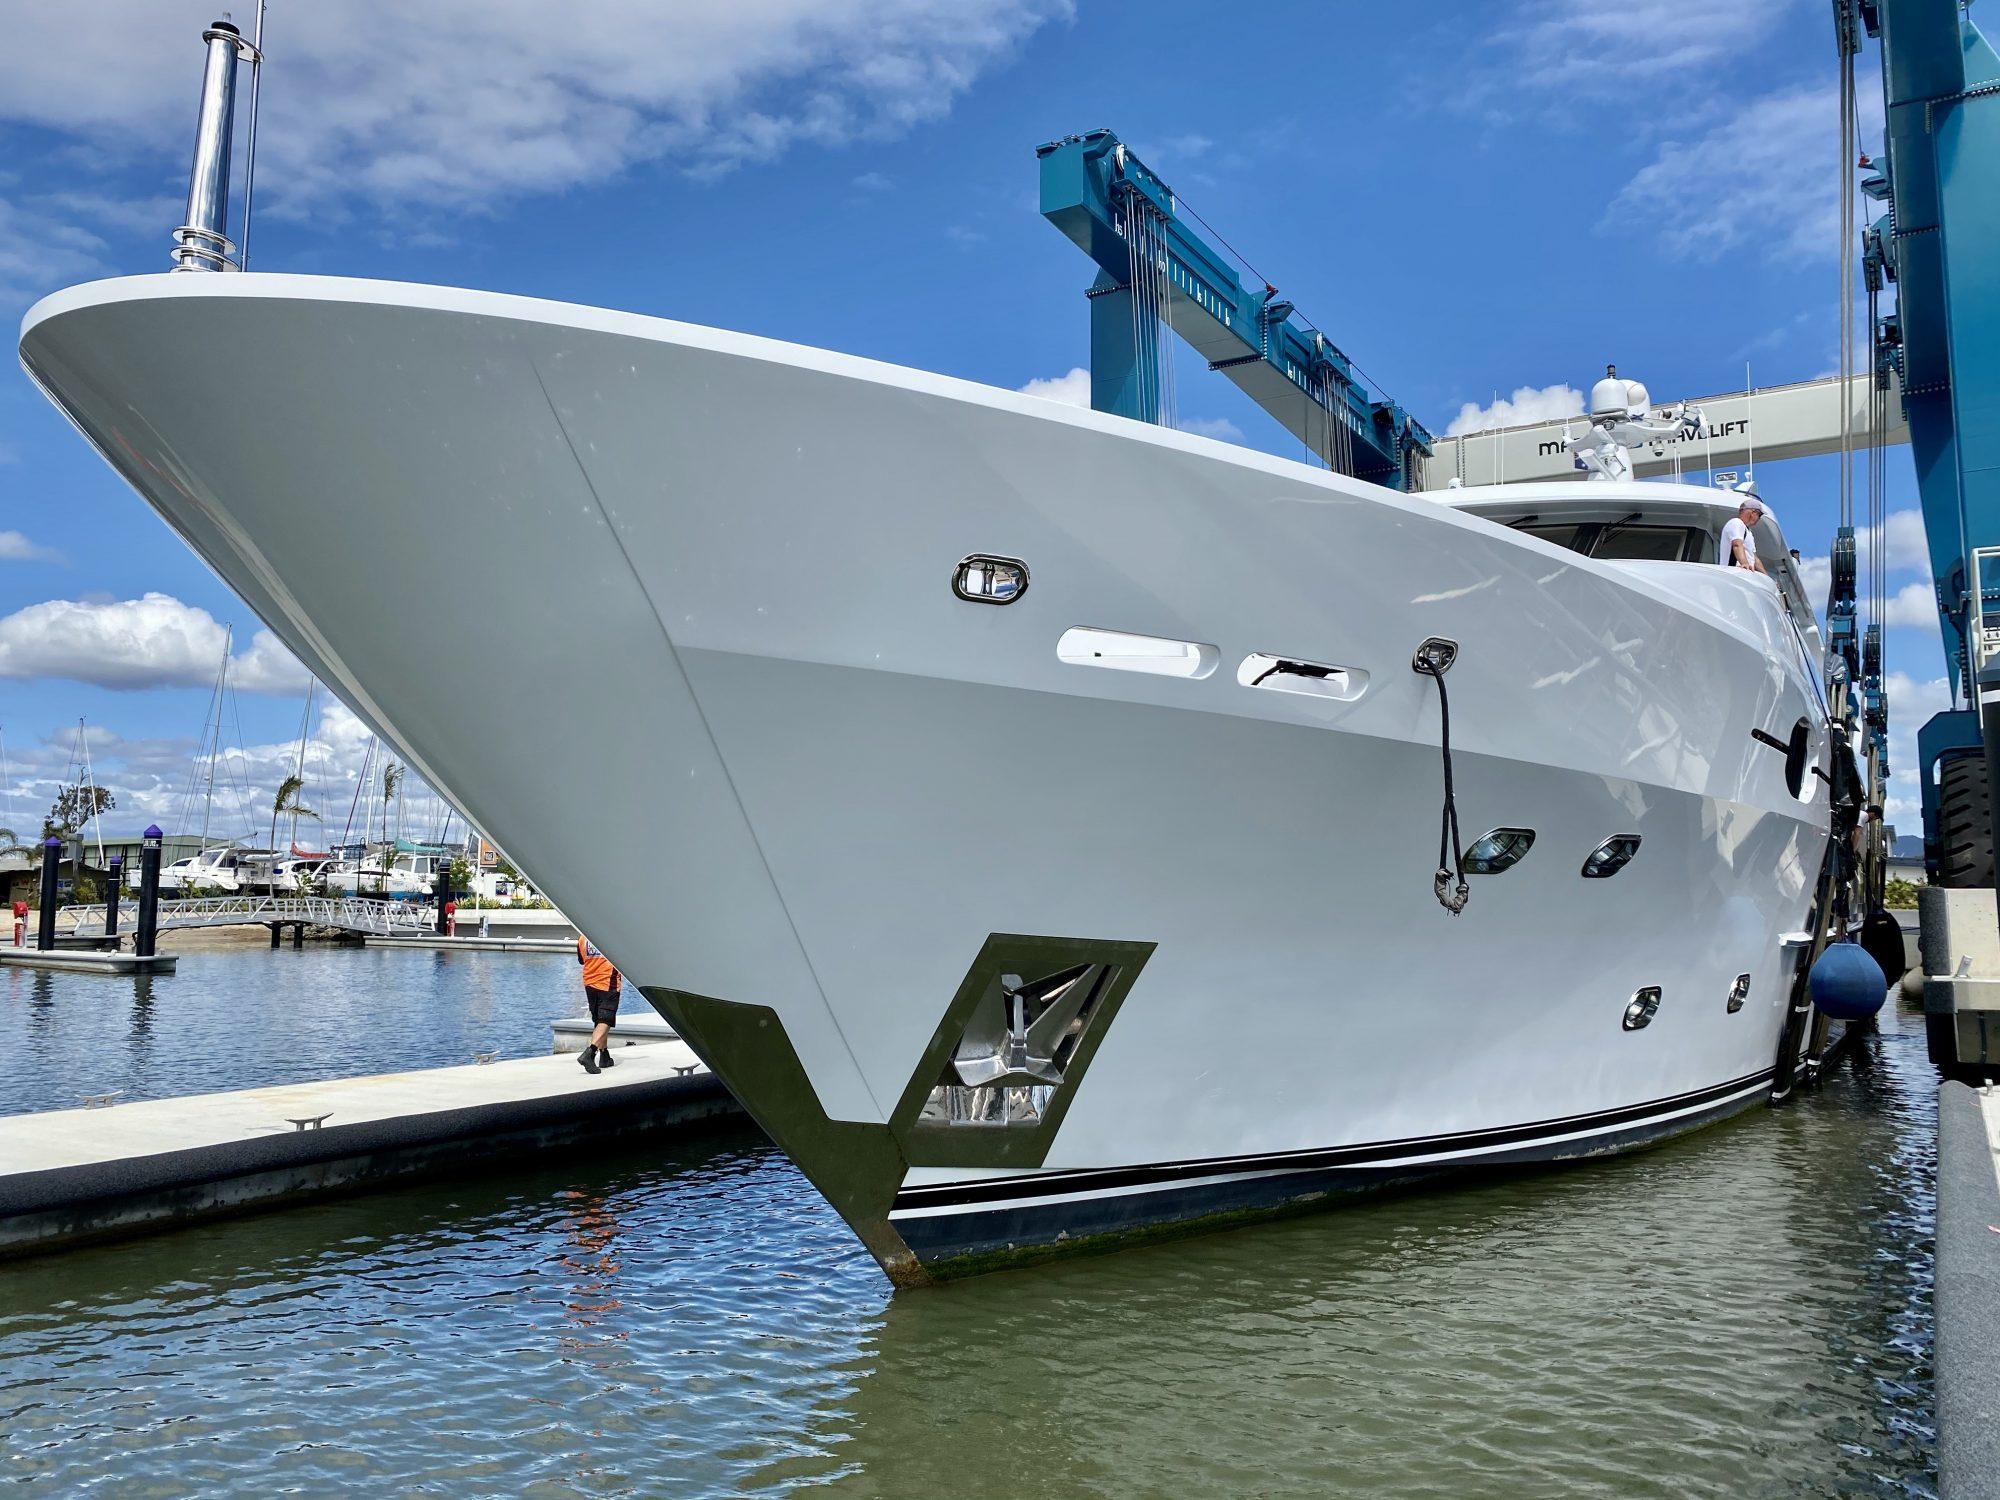 41m Sovereign Motoryacht Batavia The Boat Works 300 tonne lift